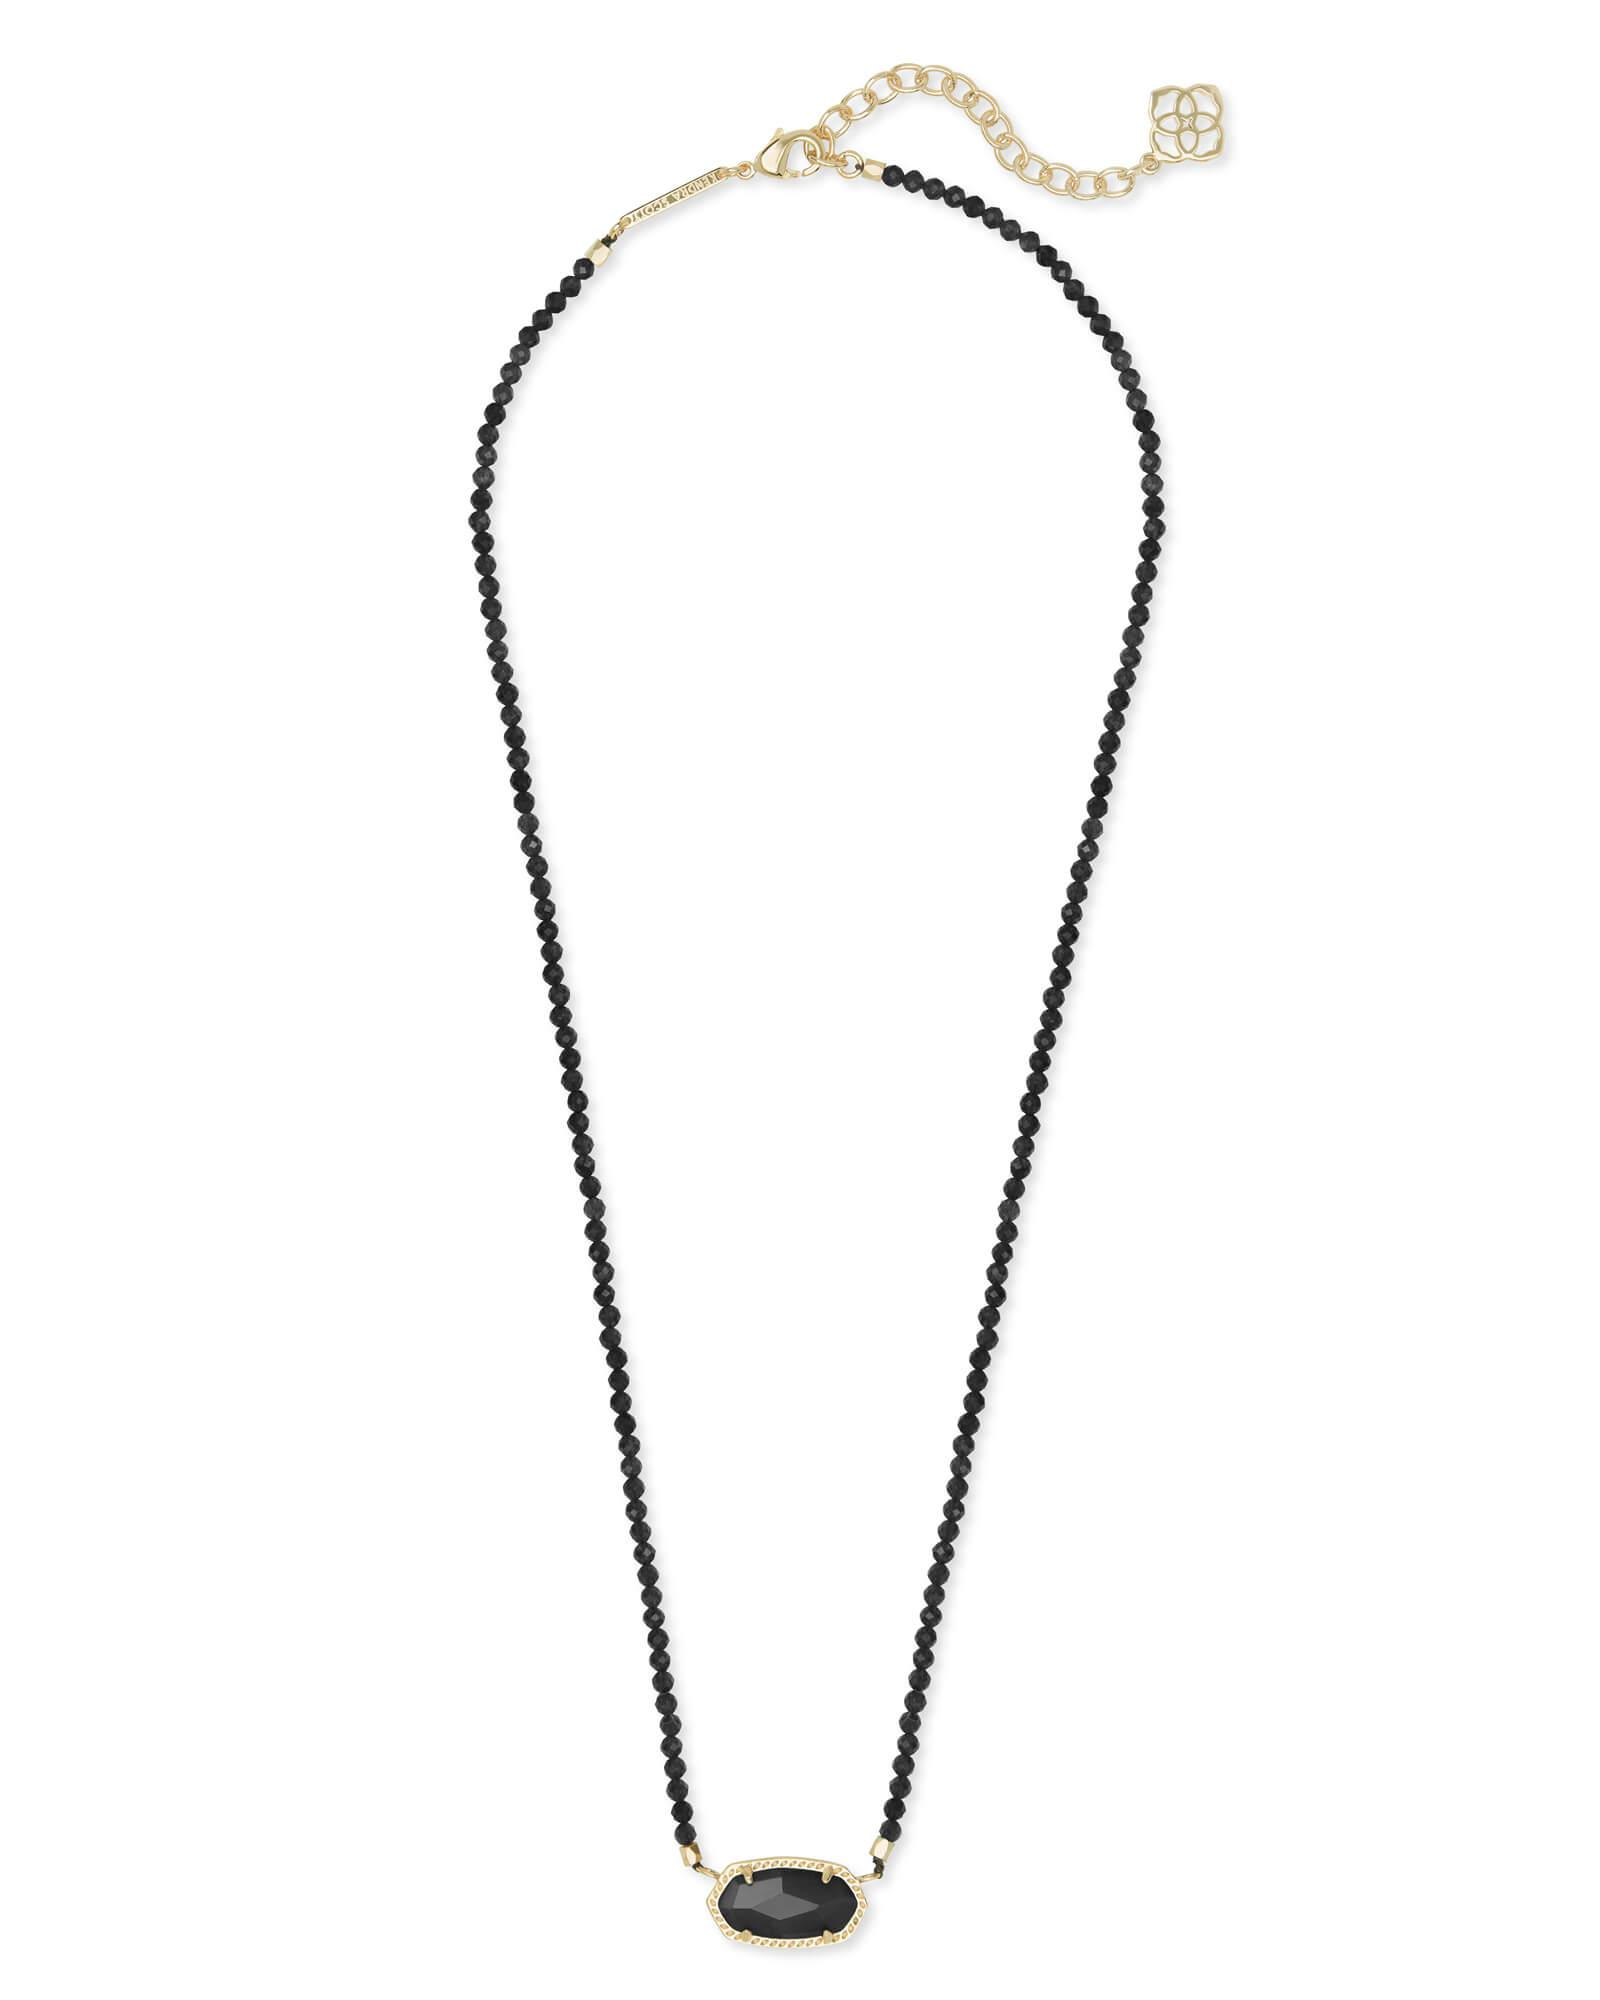 2c47330f6 Lyst - Kendra Scott Elisa Gold Beaded Pendant Necklace in Metallic